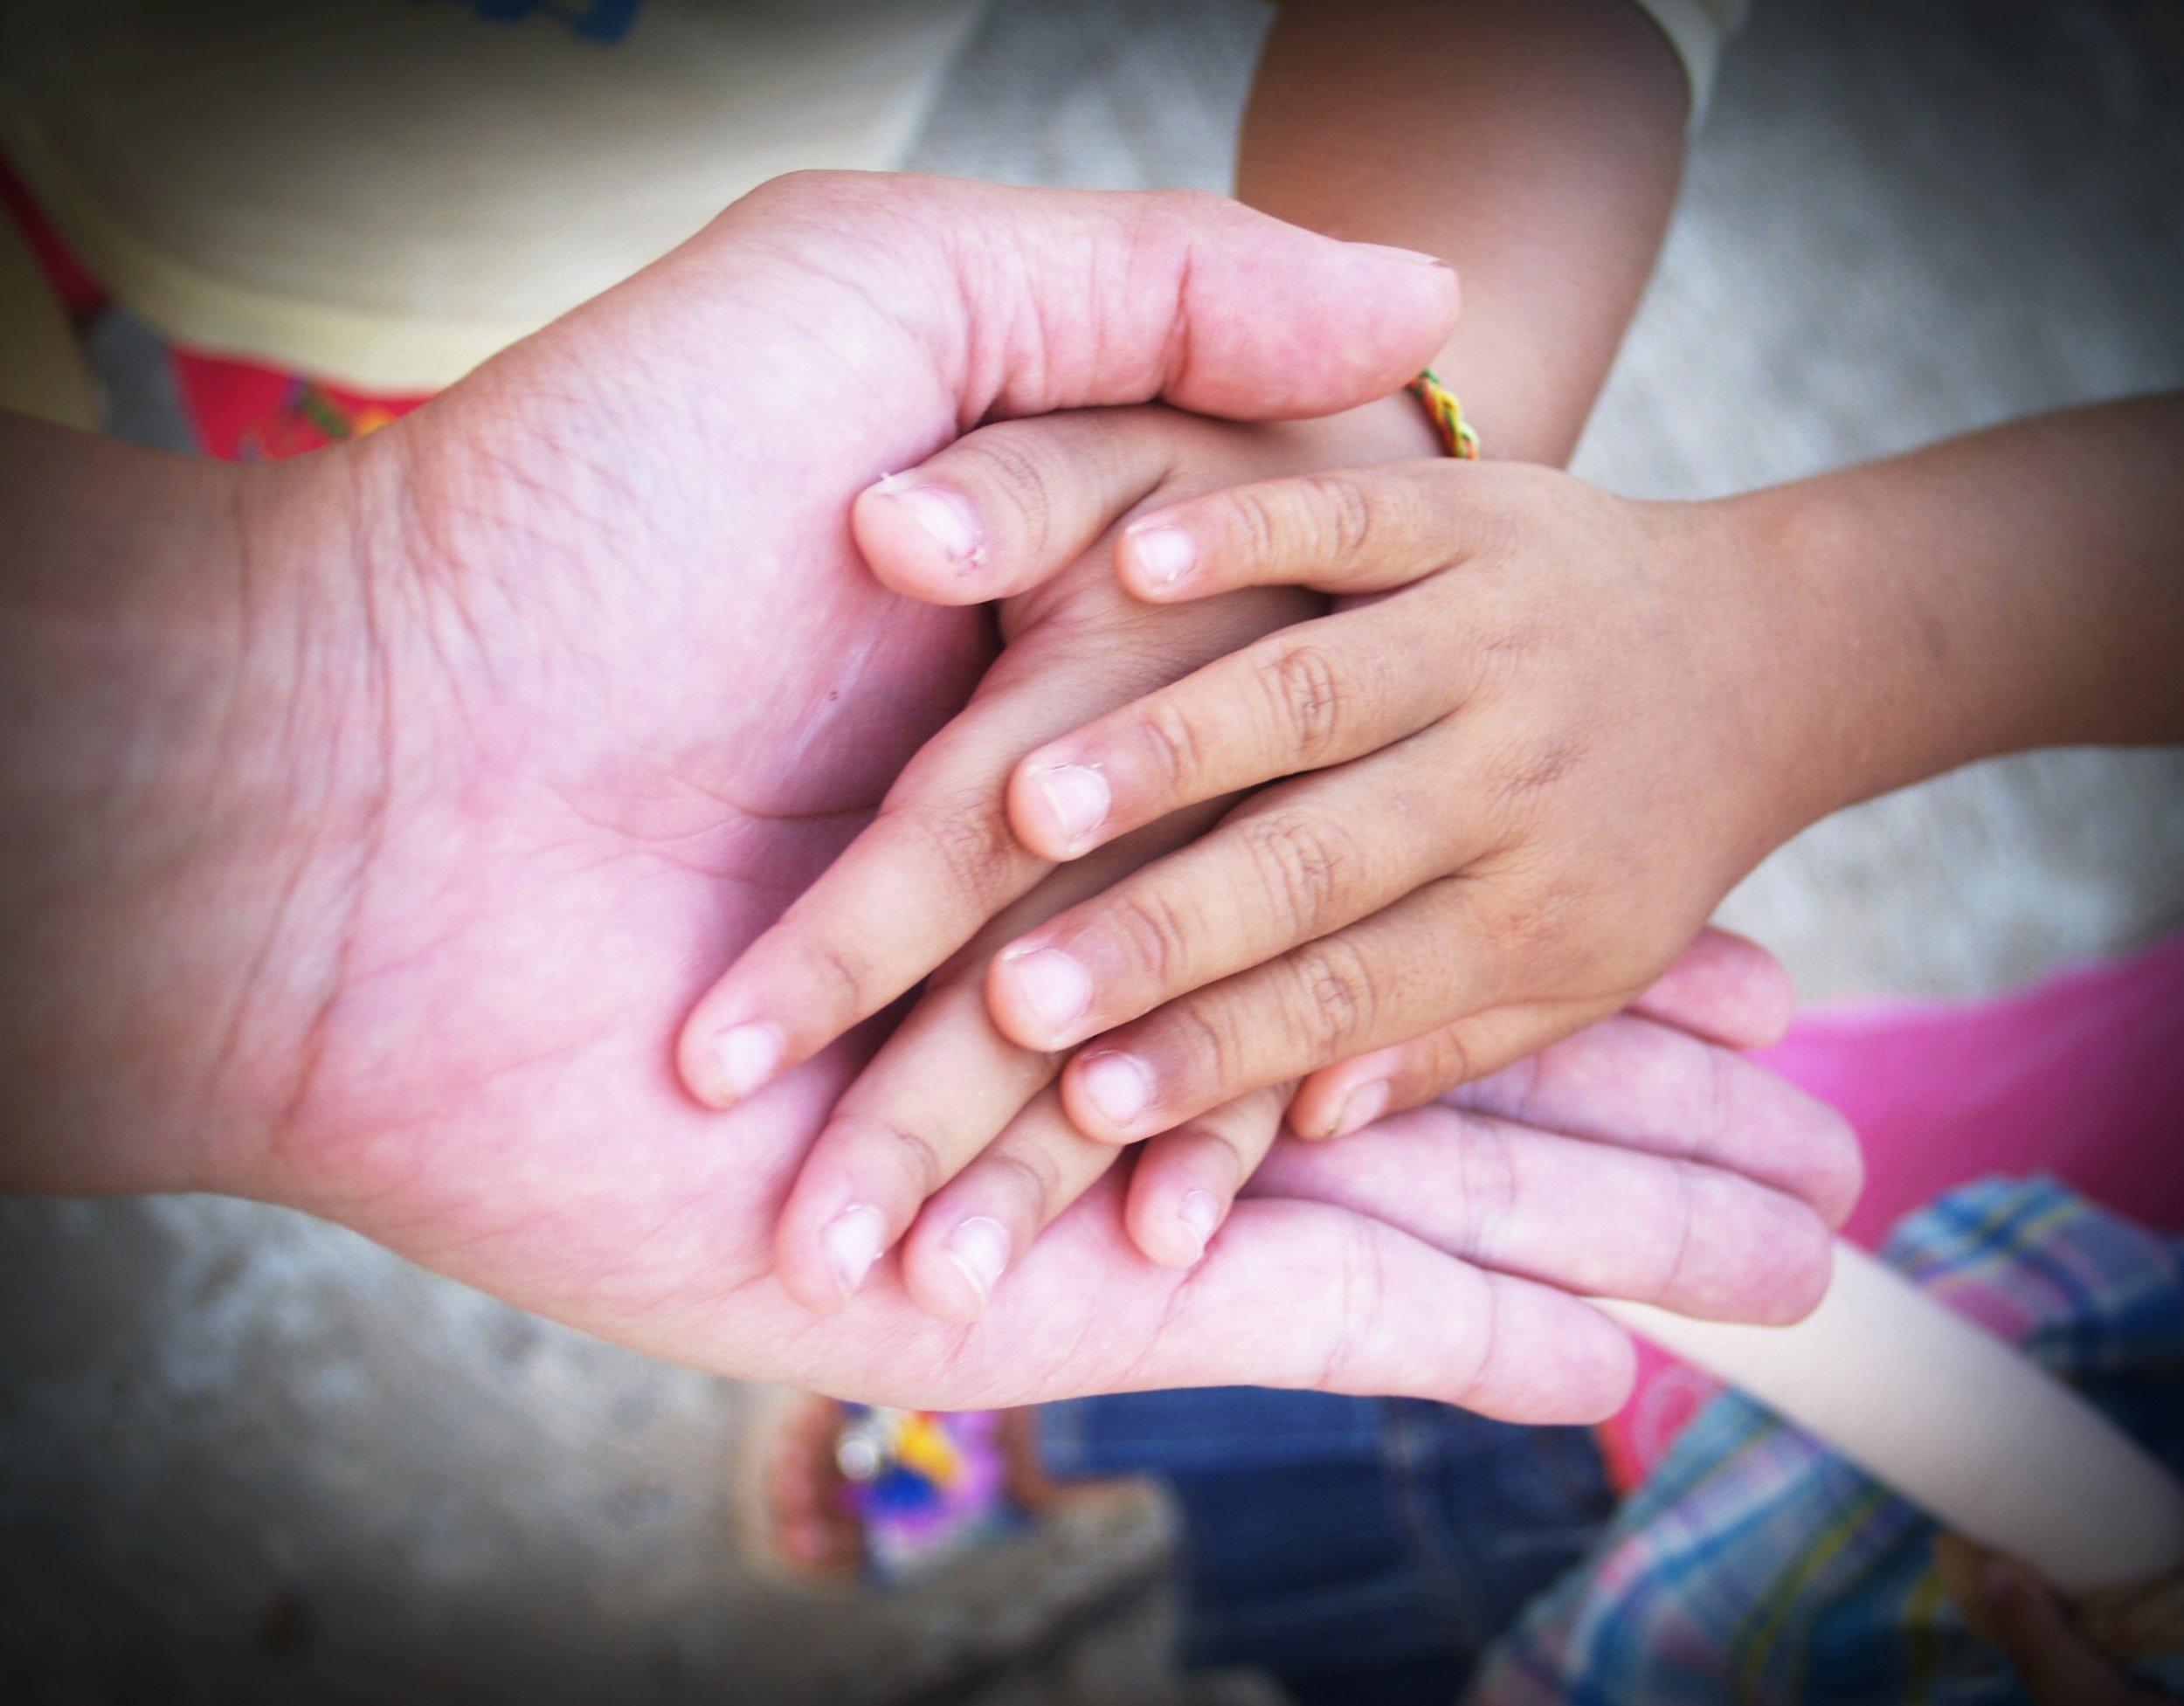 Many hands …